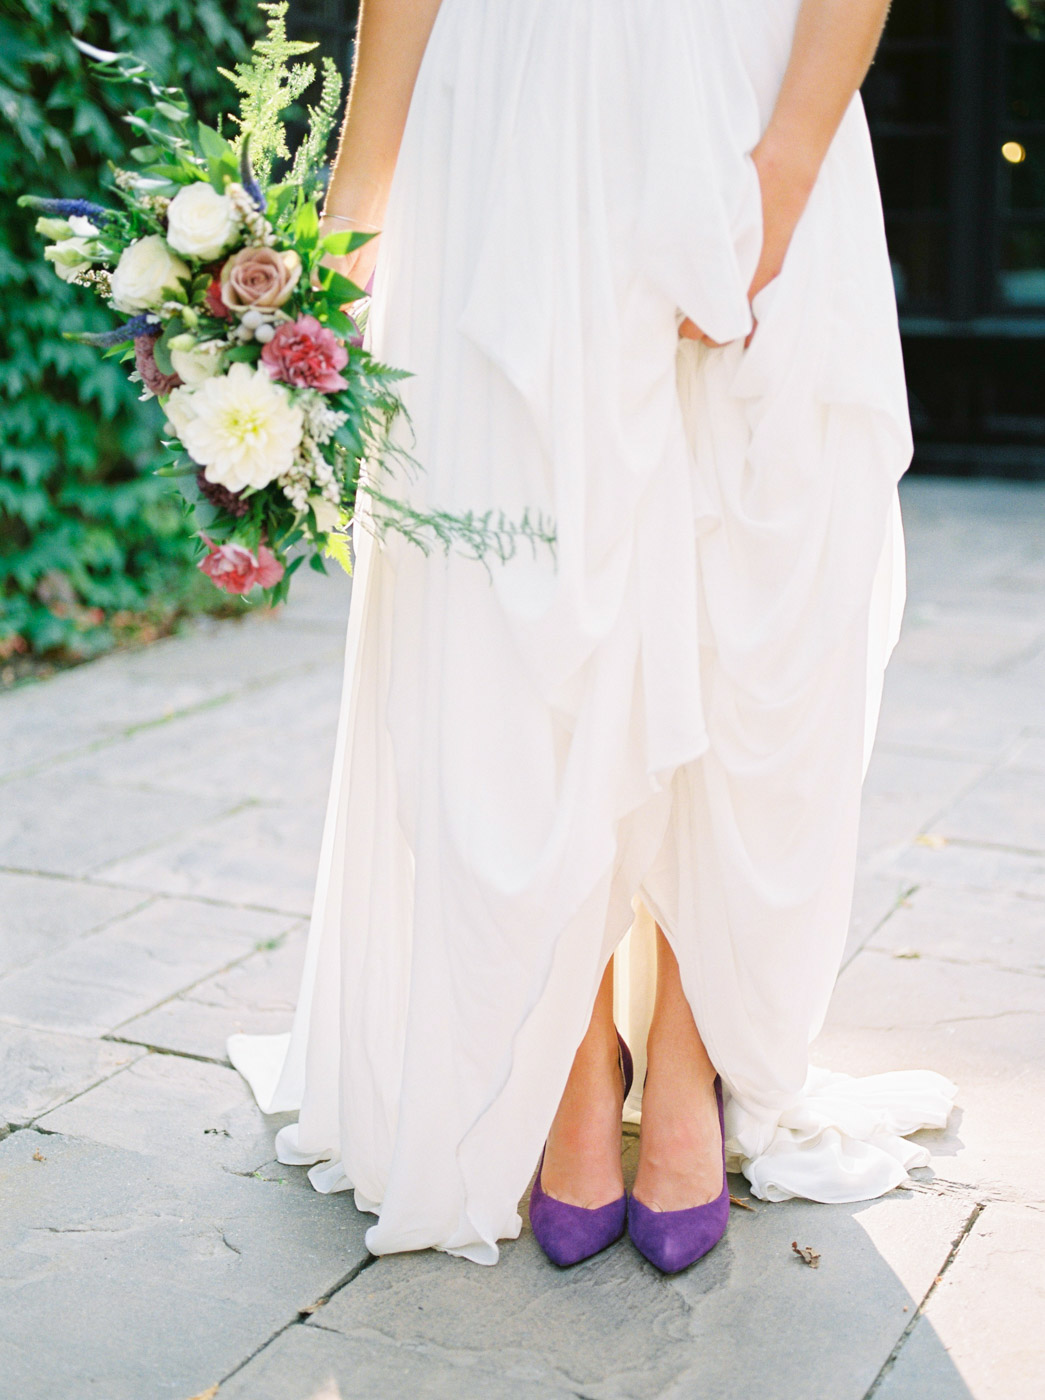 wedding_photography_tips_best_photography_lighting-15.jpg